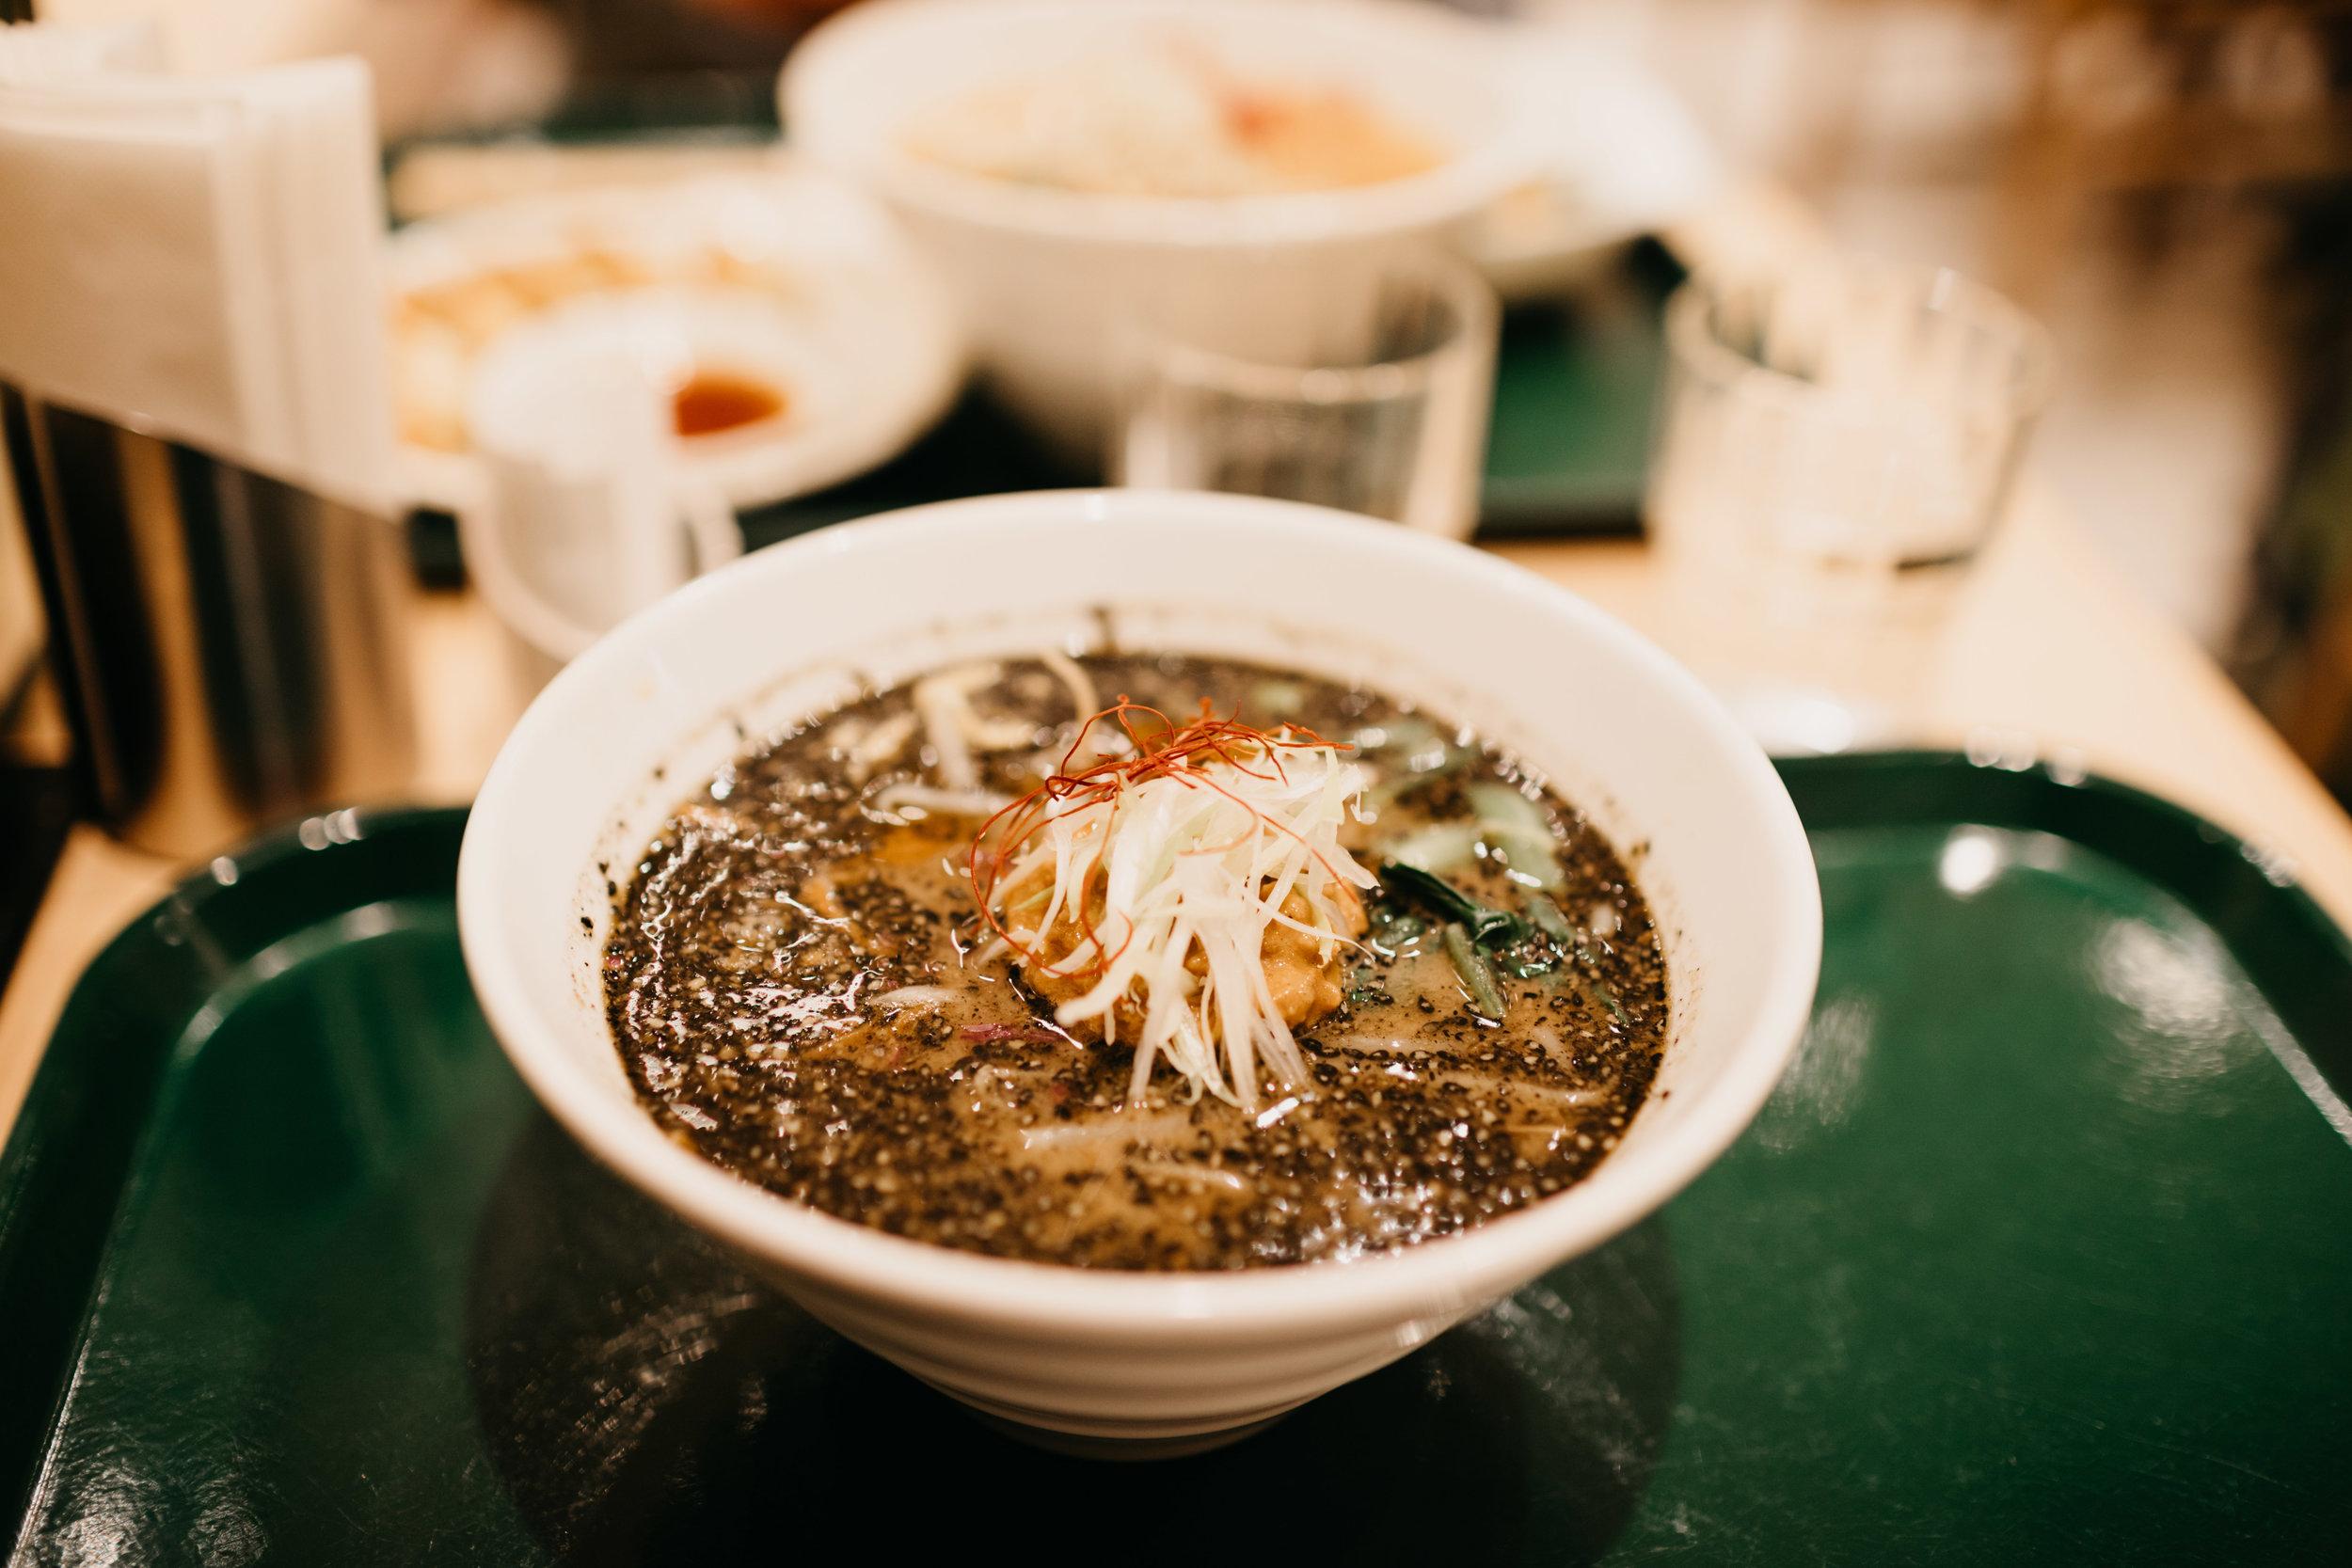 tokyo-vegan-ramen-photo-by-samantha-look.jpg